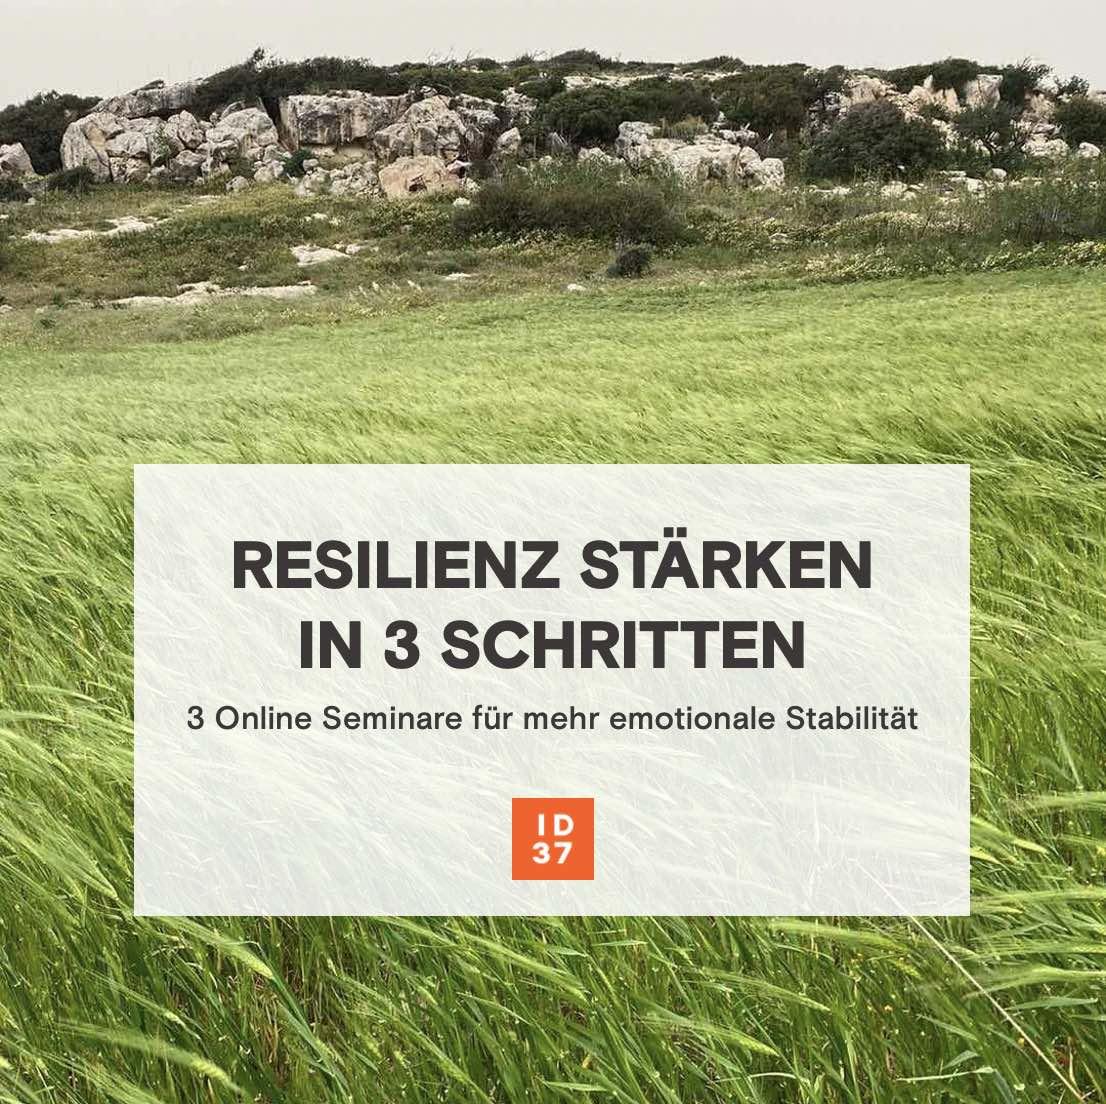 ID37-Resilienz-lernen-stärken